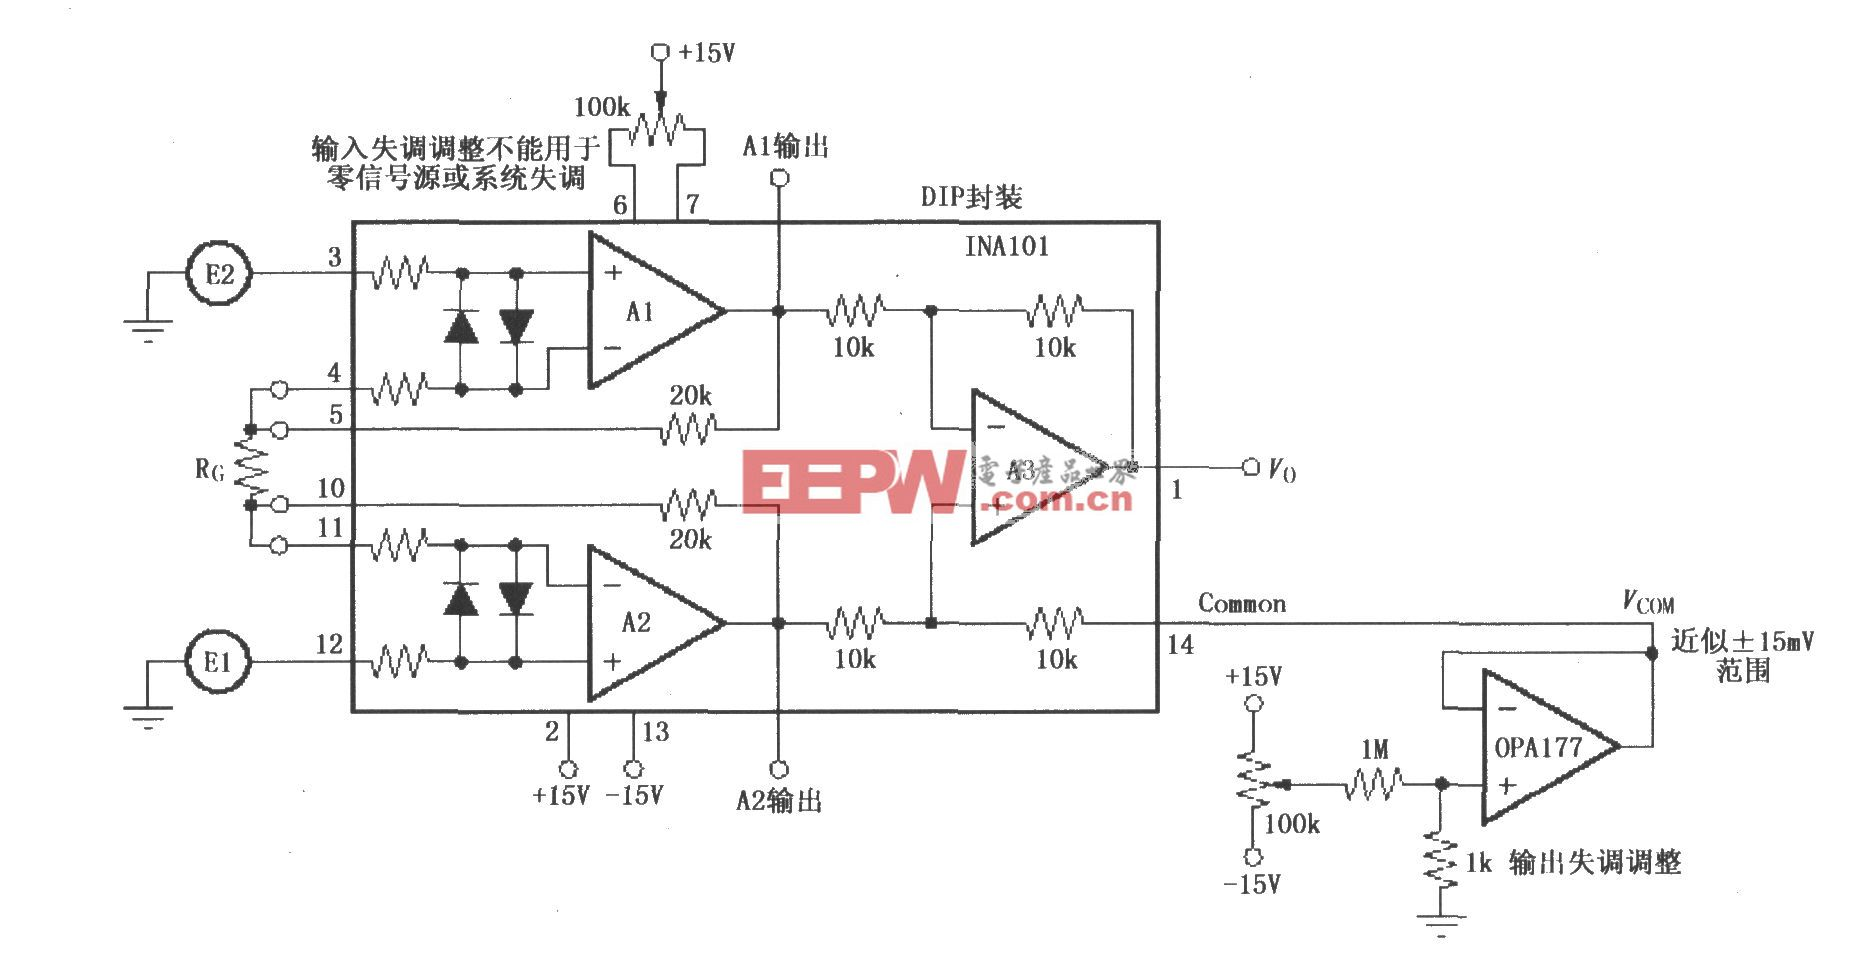 INA101的可微调输入和输出失调电压电路